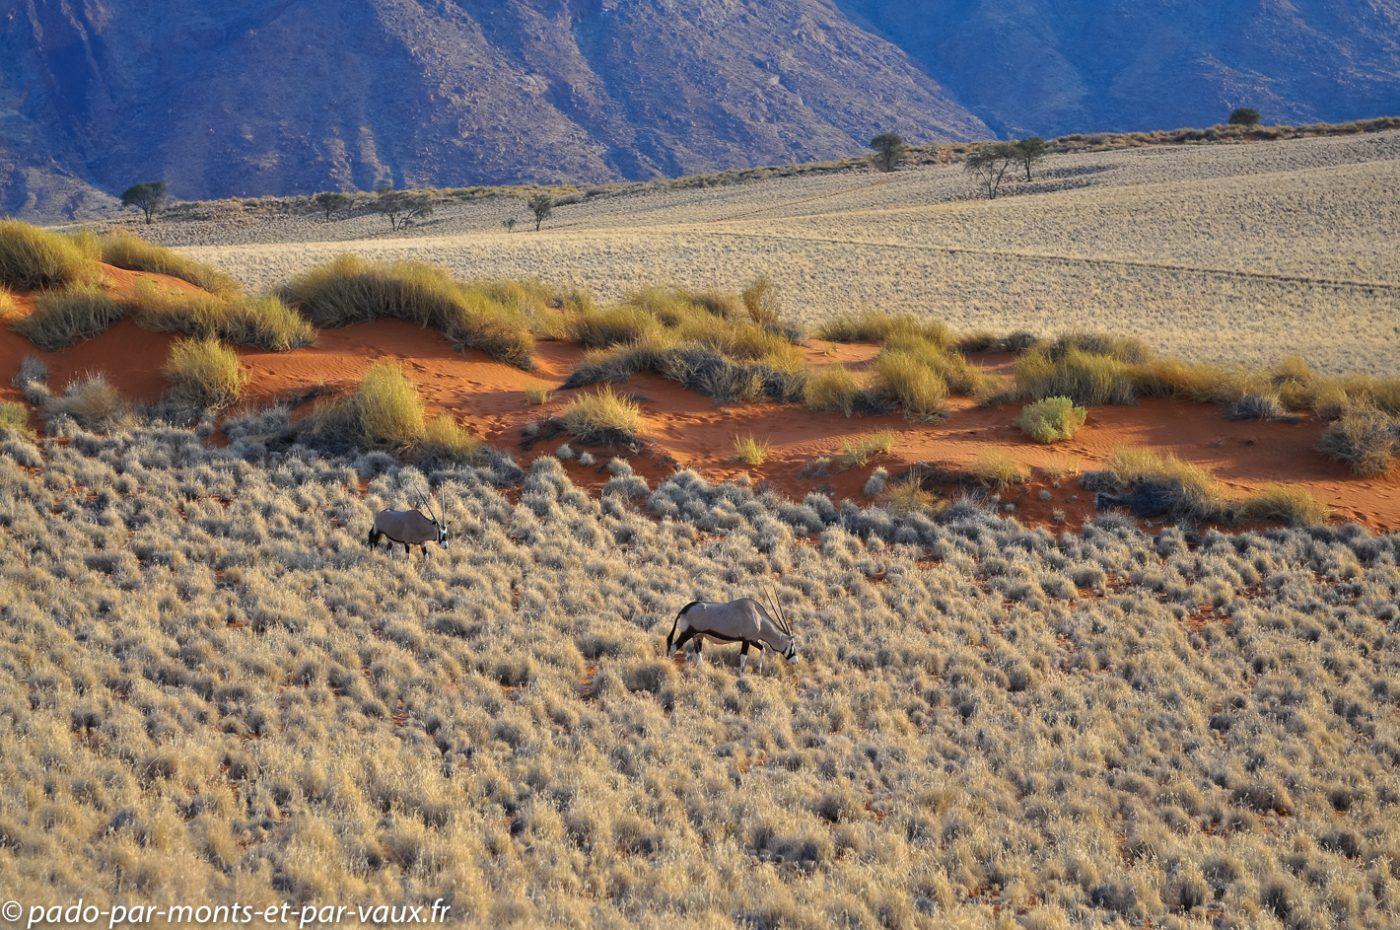 Namibie 2013 - Tok Tokkie trail